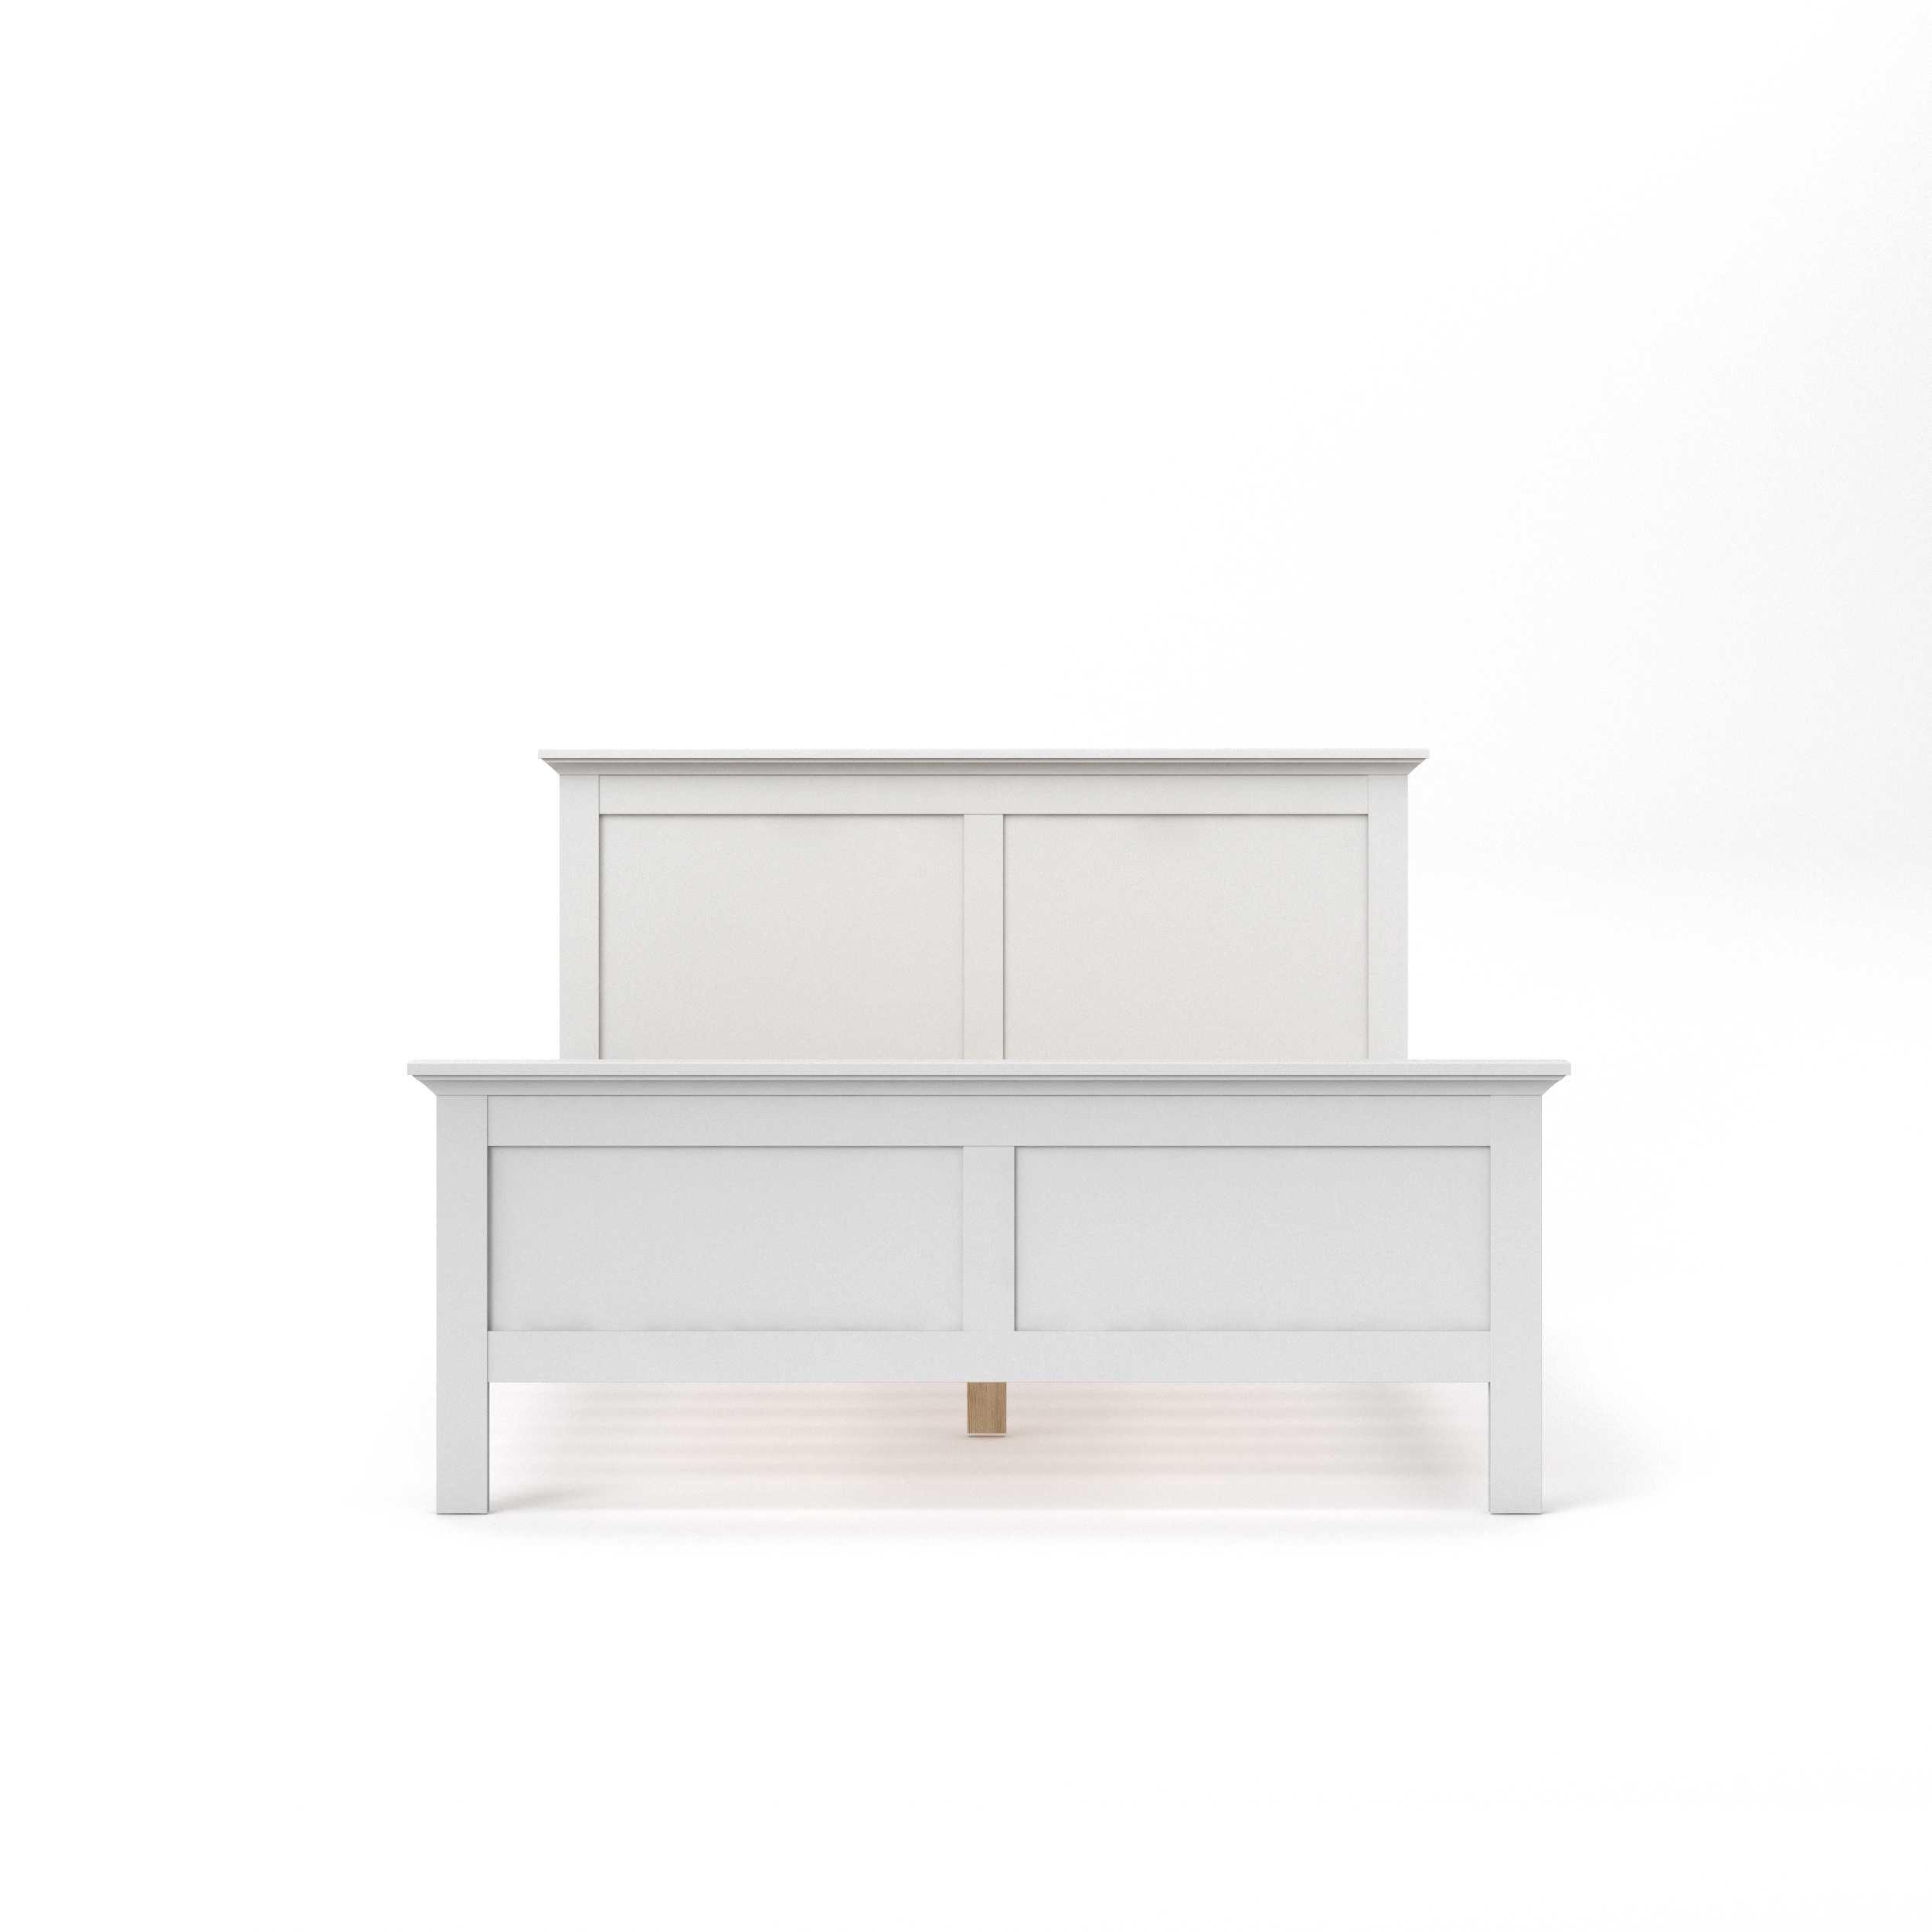 Paris sengeramme - hvid tr (140x200)